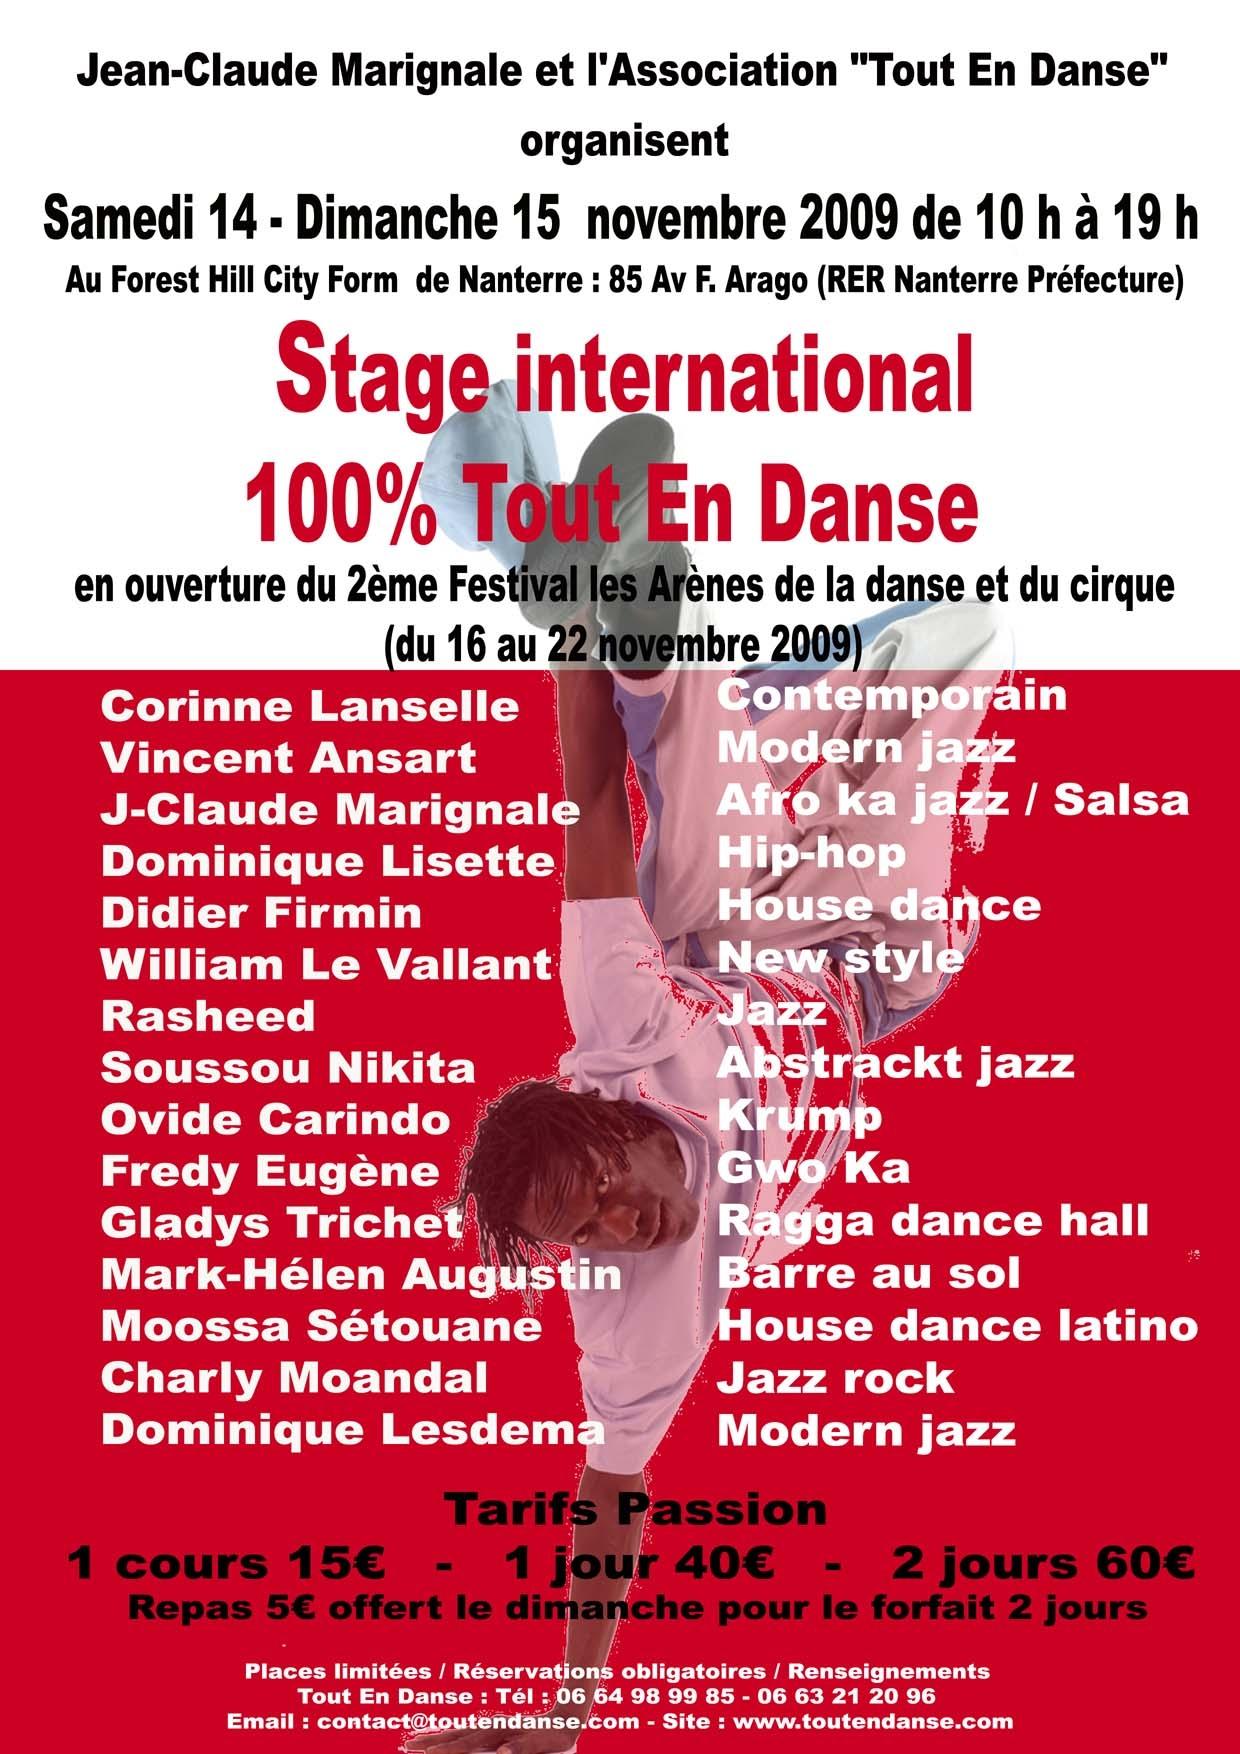 affiche-stage-14-15-11-09-apl-web.jpg